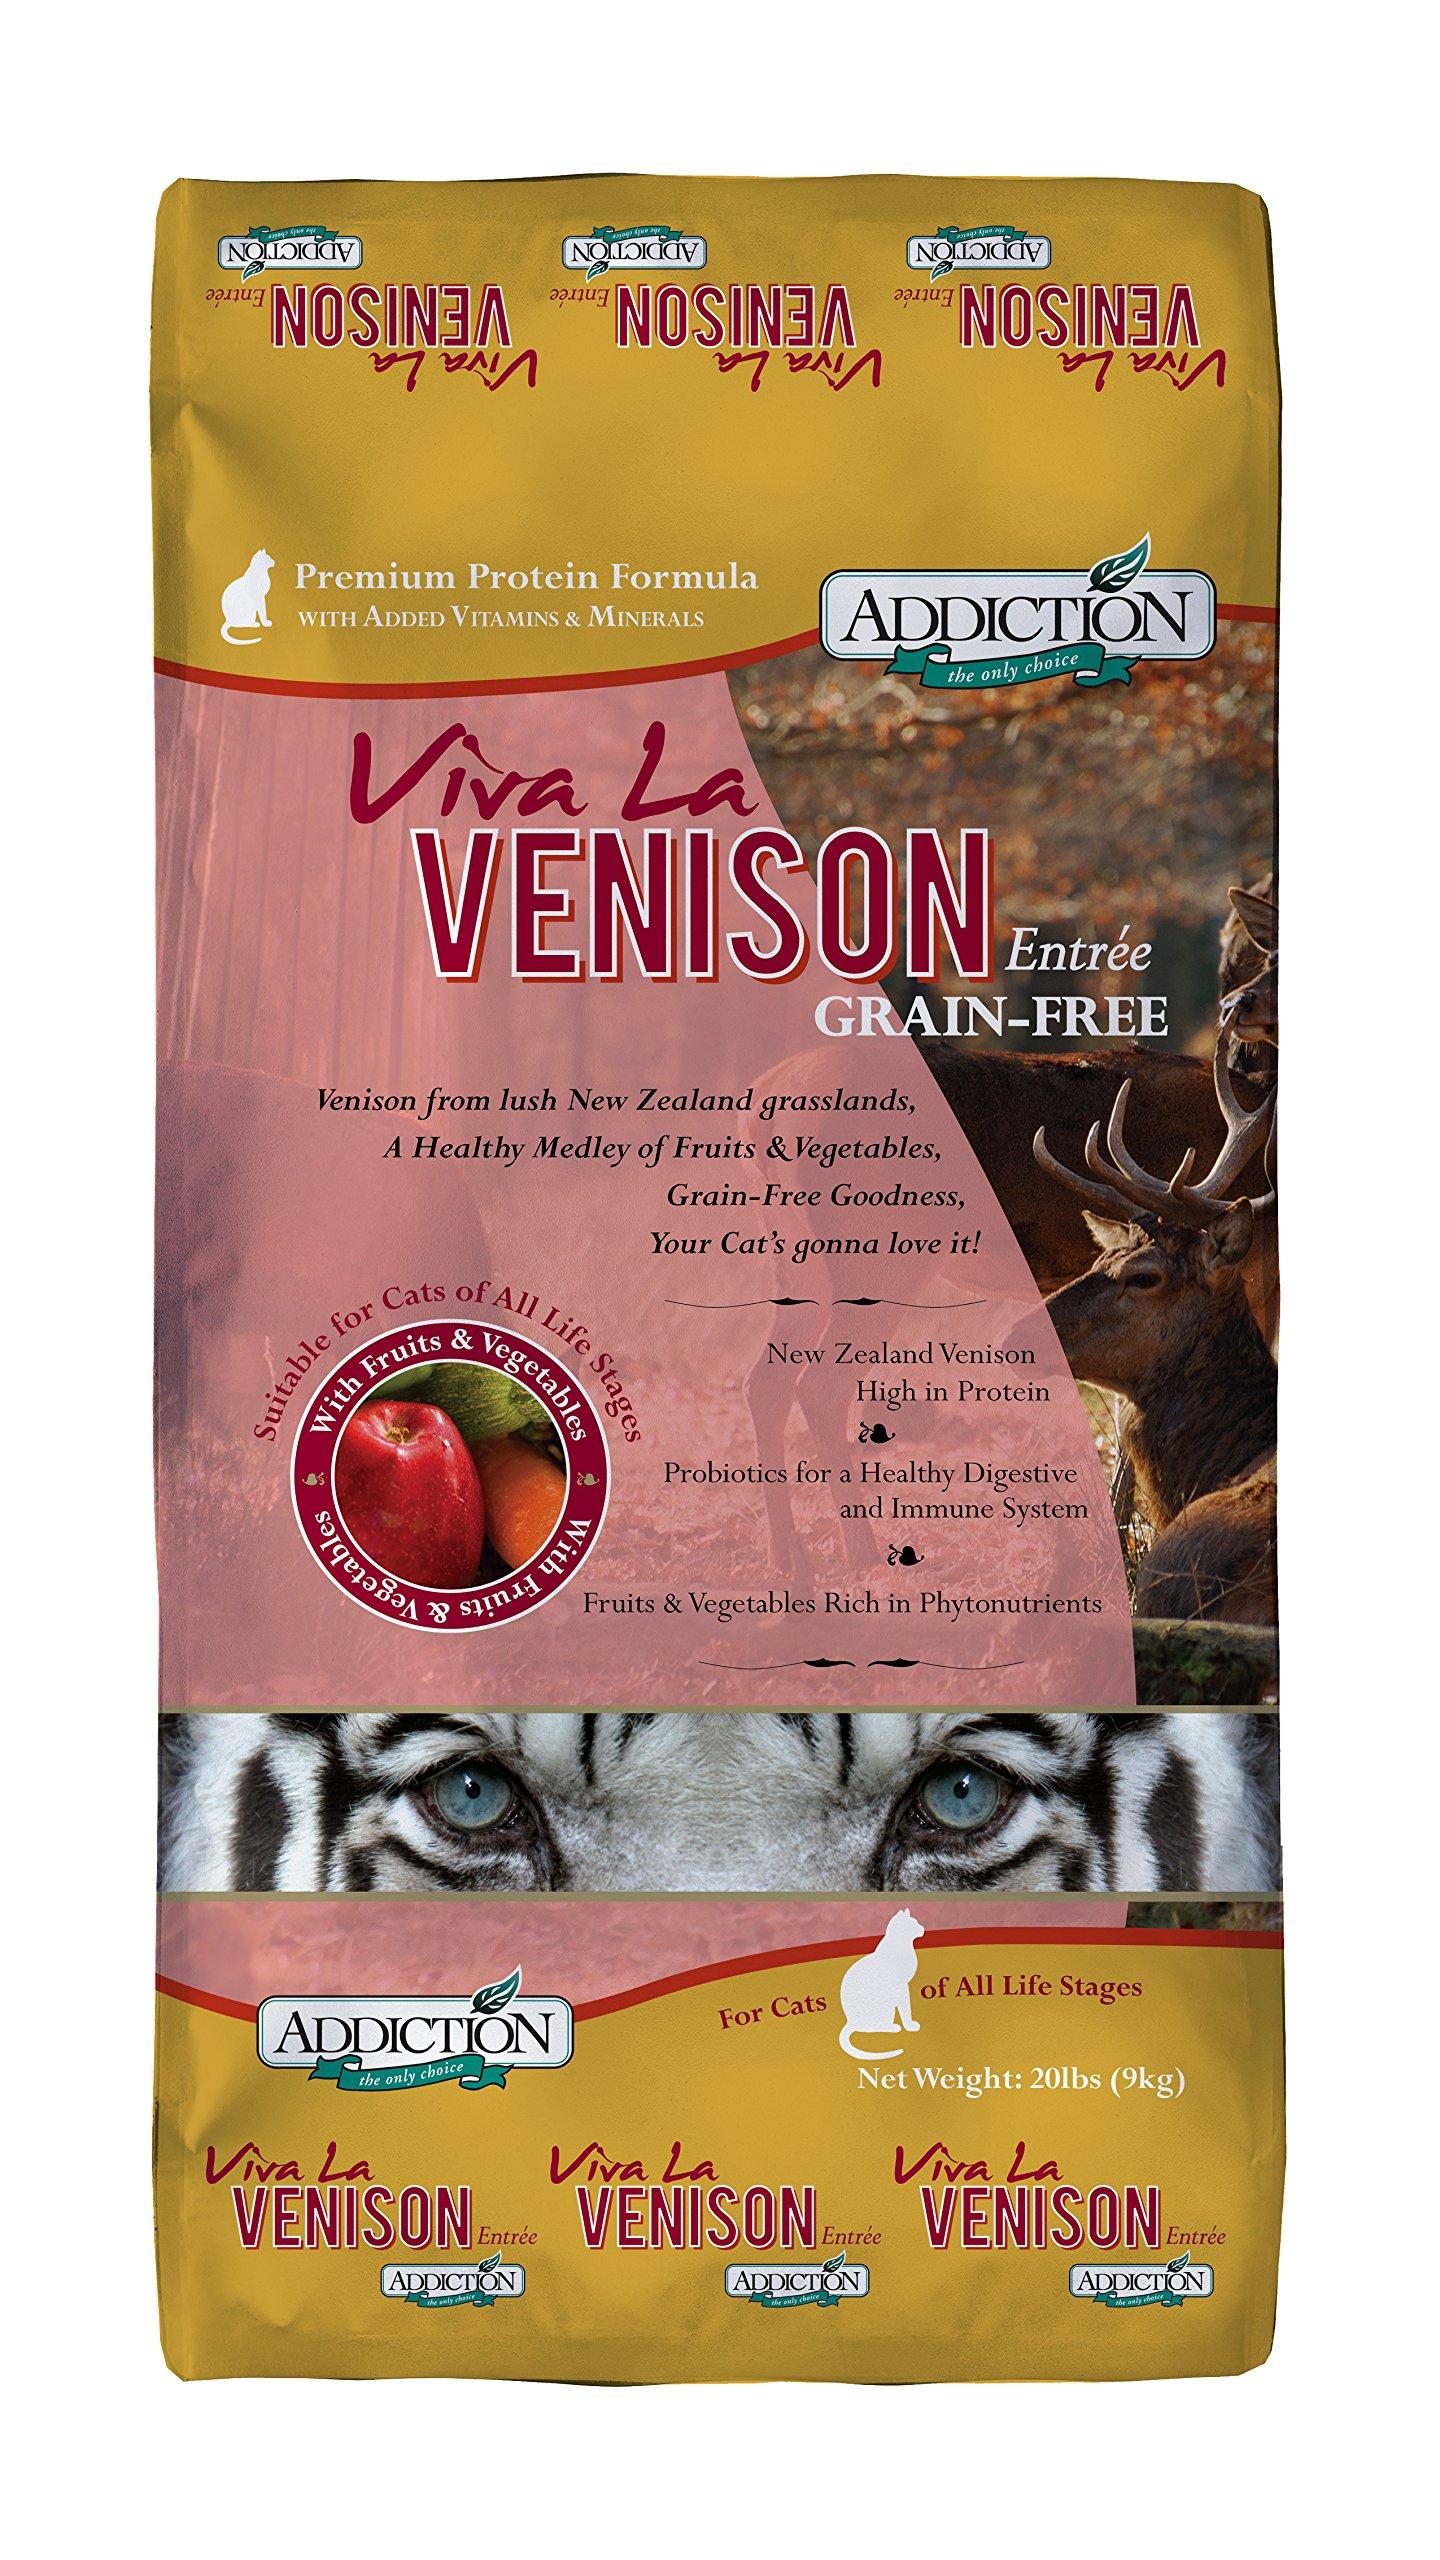 Addiction Viva La Venison Grain Free Dry Cat Food, 20 Lb. by Addiction Pet Foods